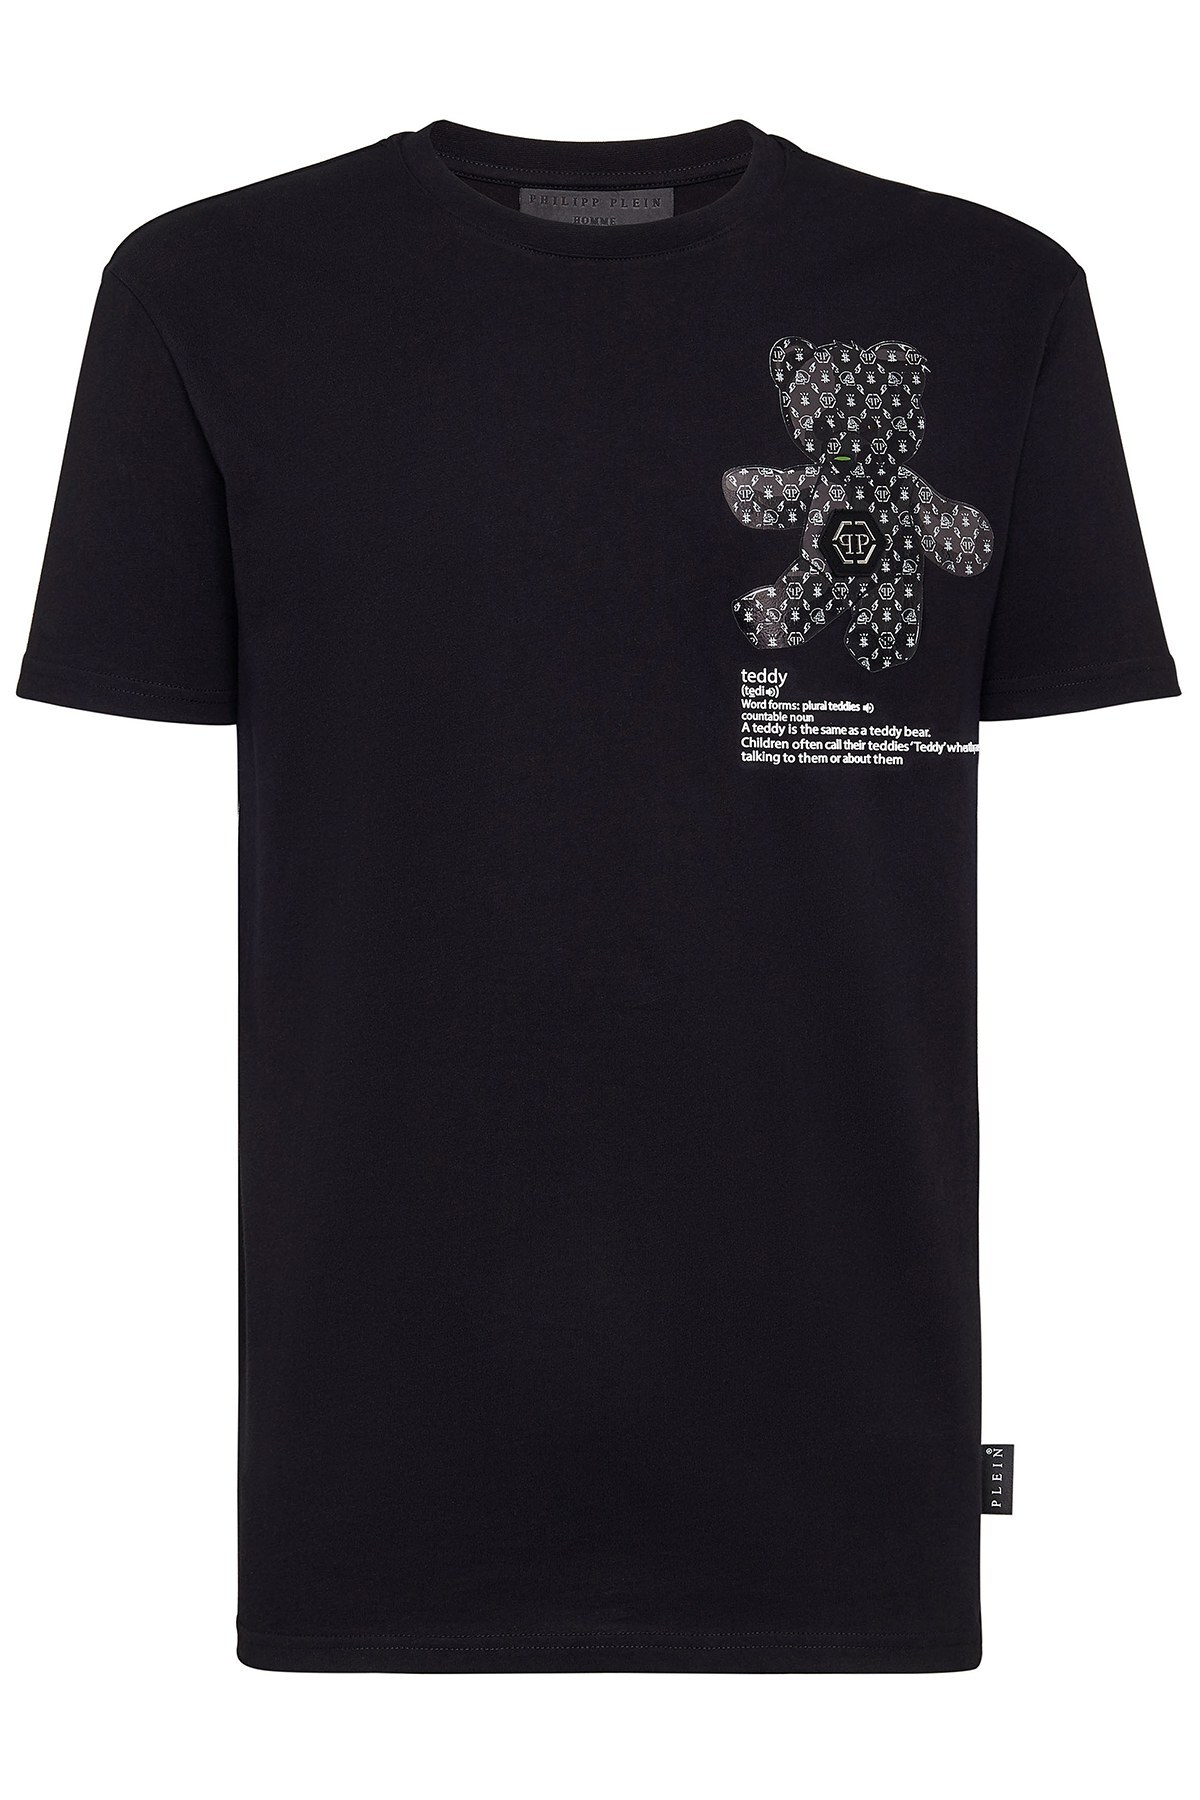 Philipp Plein Baskılı % 100 Pamuklu Erkek T Shirt F20C MTK4583 PJY002N 02 SİYAH